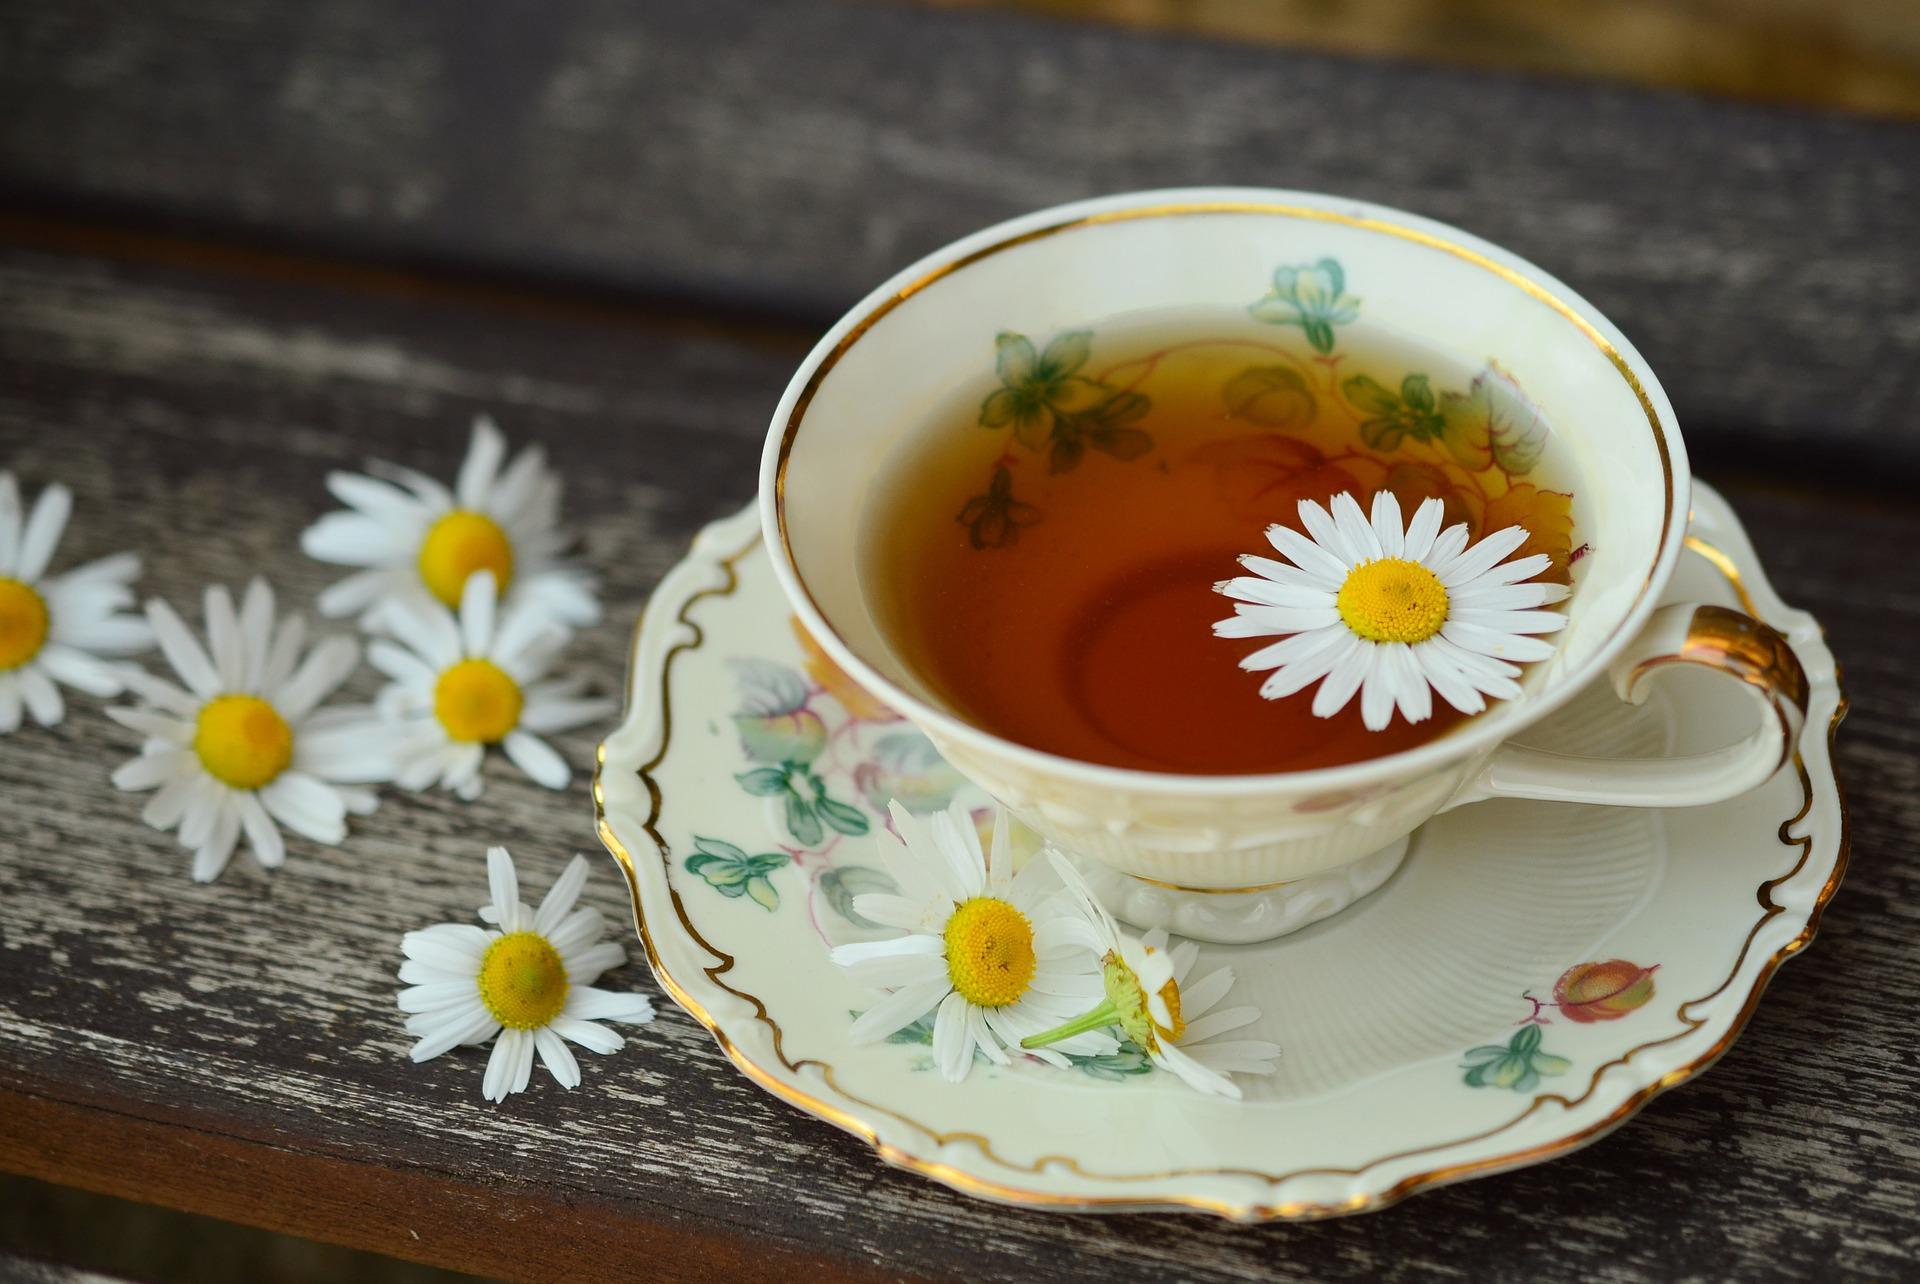 Best Gut Detox Tea - to remove toxins - True Gut Health Gut